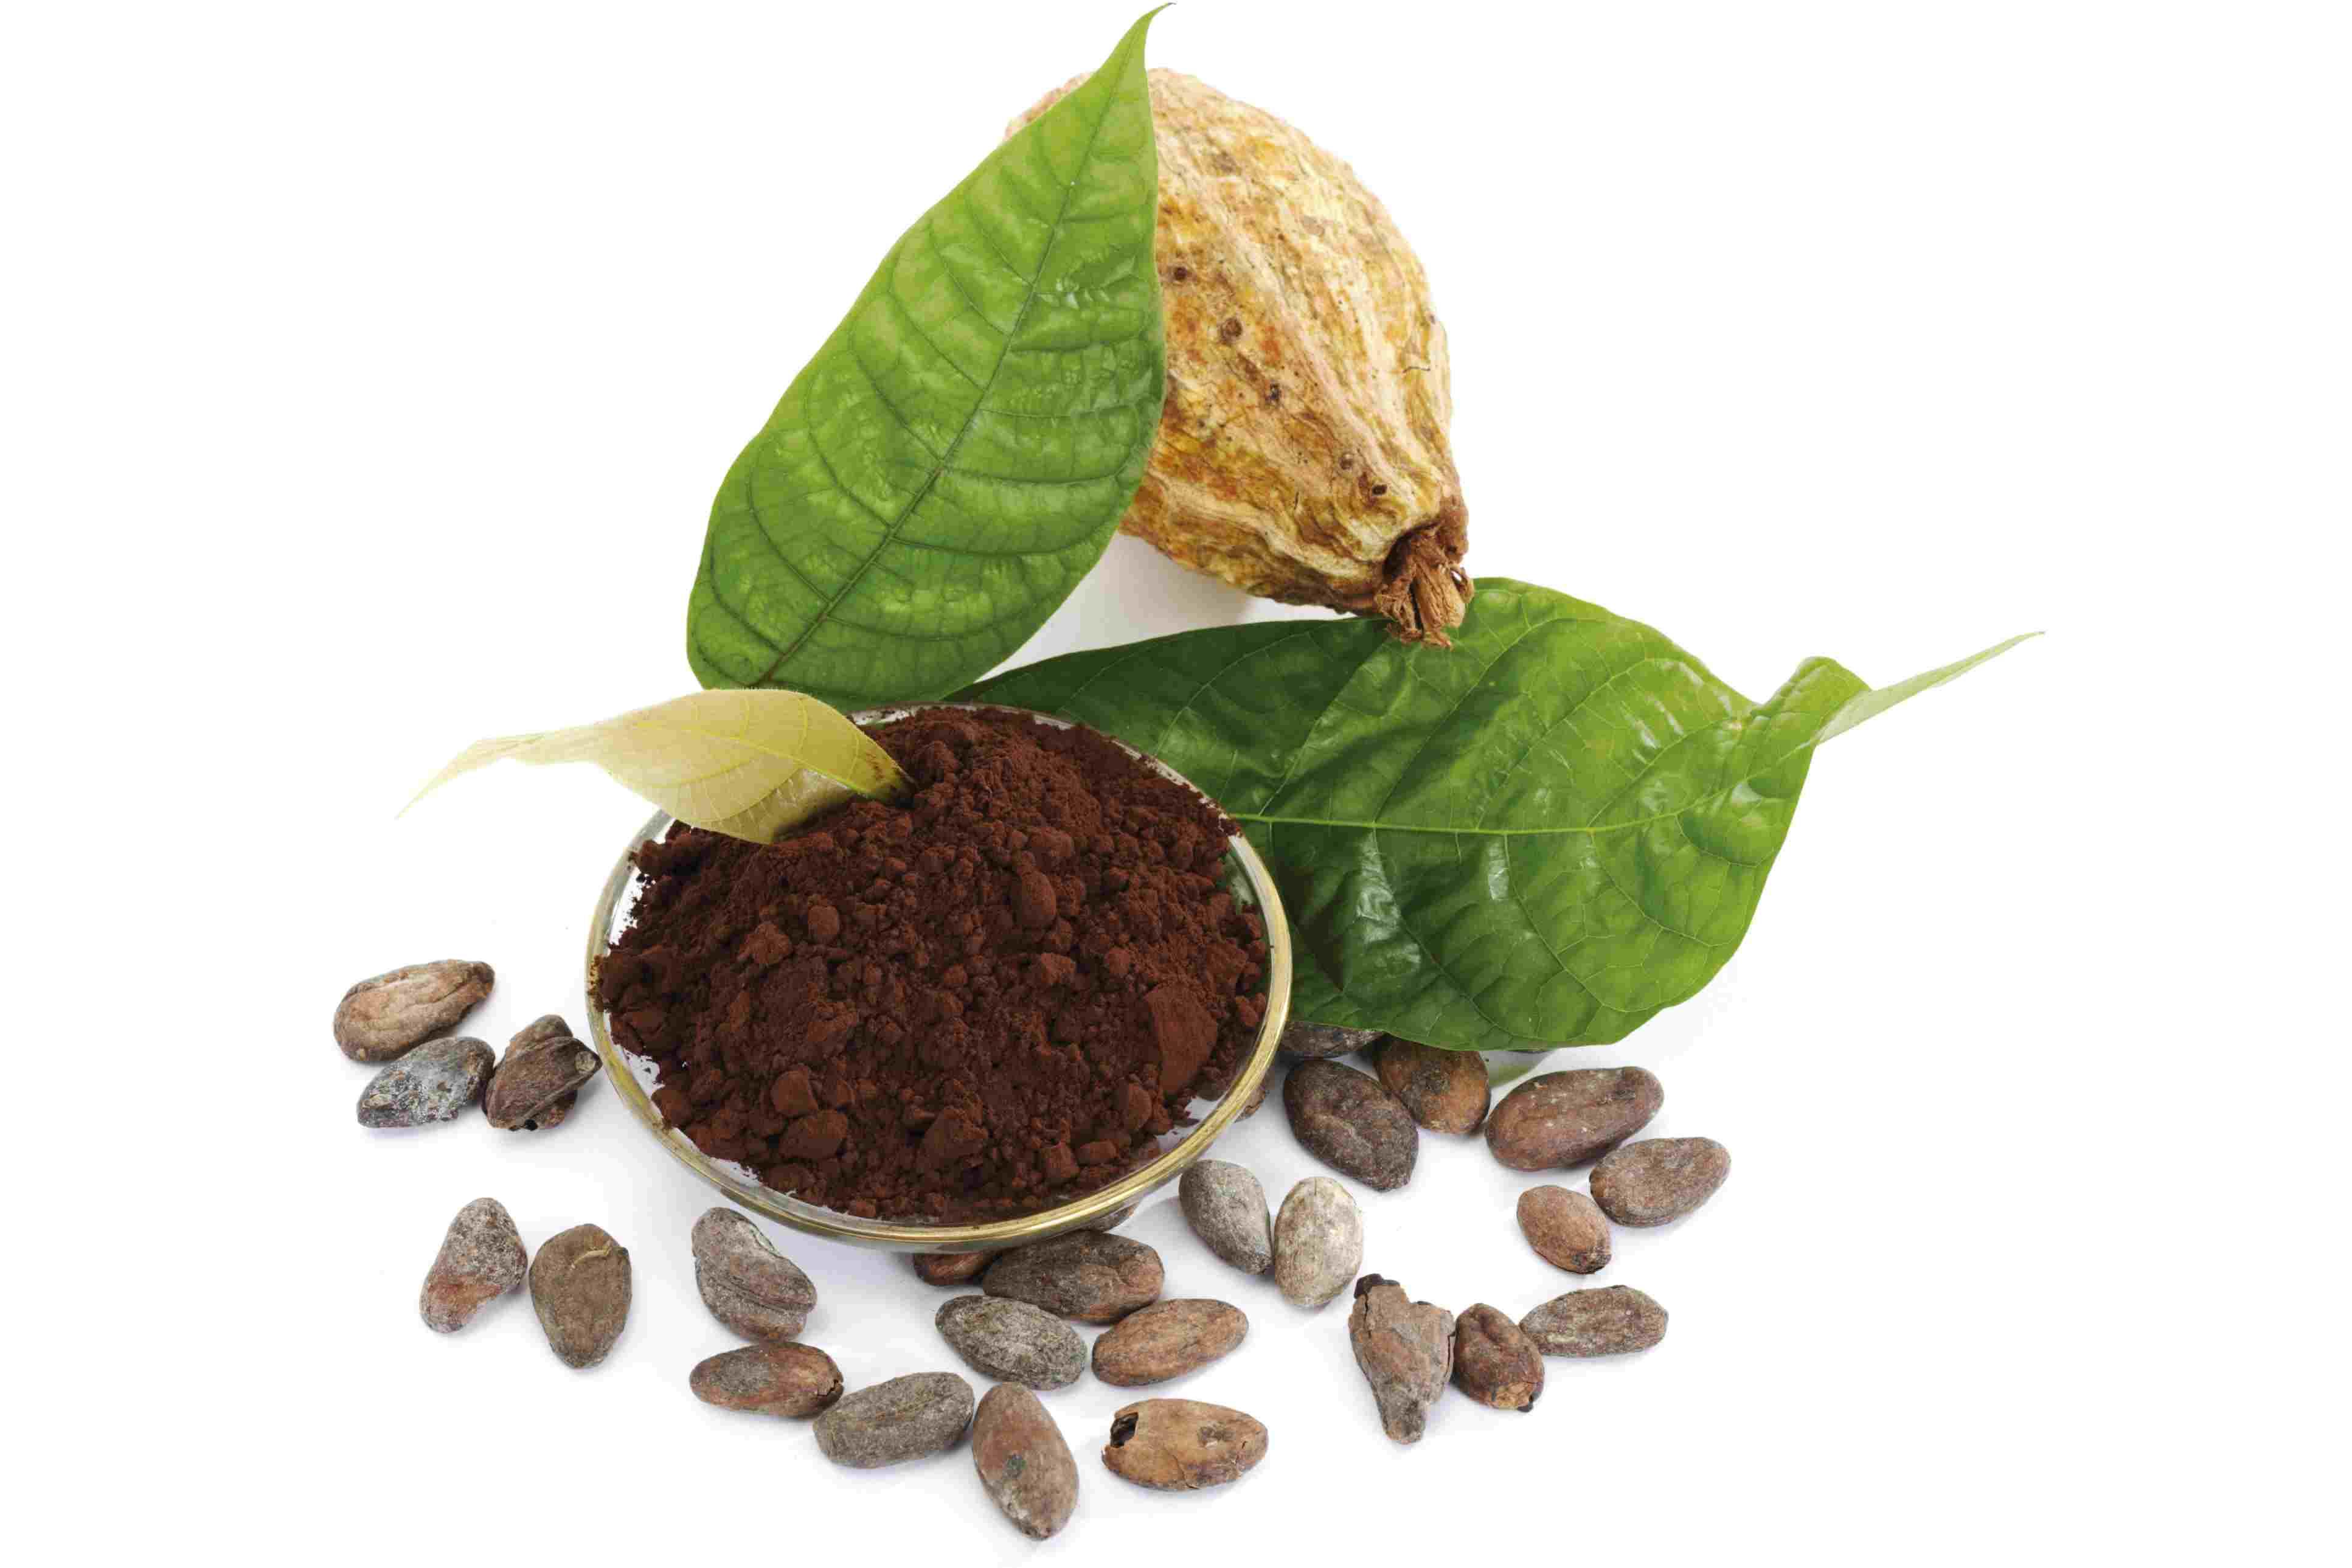 Theobromine in Cocoa Beans